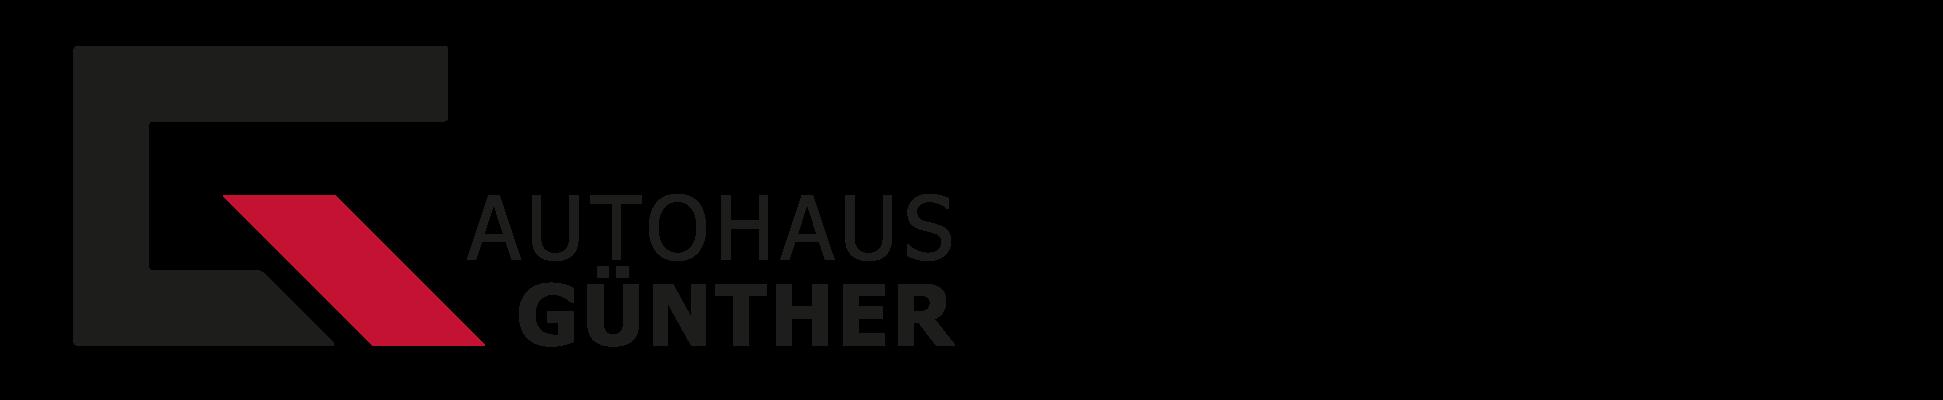 Autohaus Günther GmbH – Maserati Vertragshändler Logo